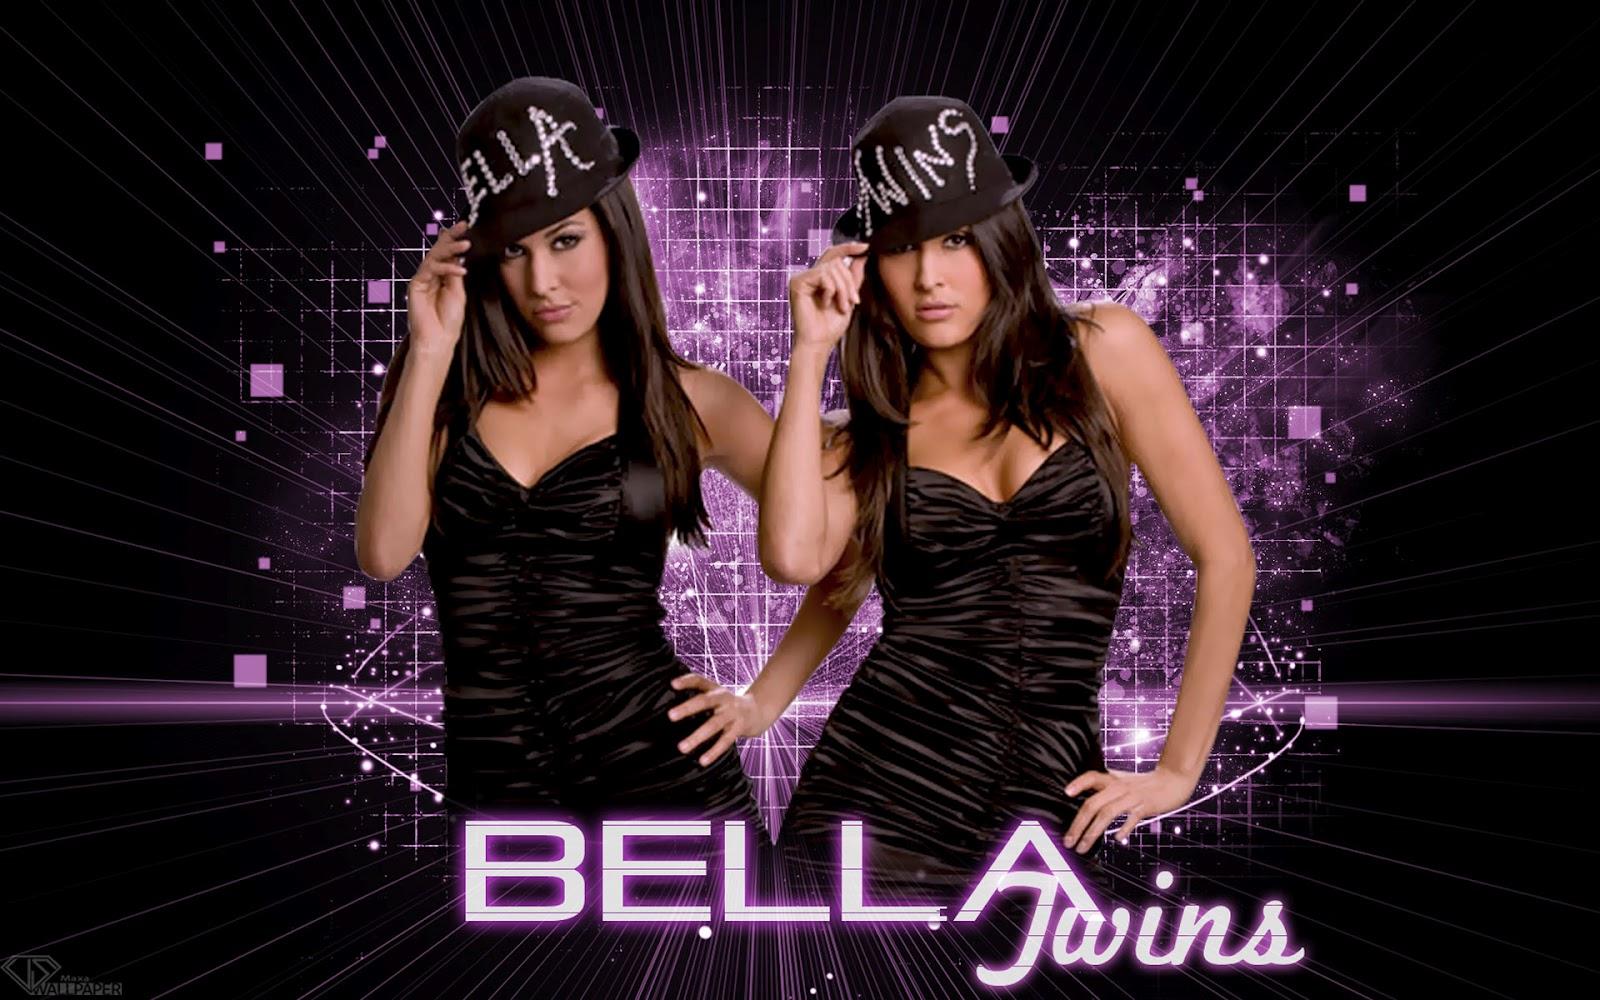 WWE WALLPAPERS The Bella twins Bellas Brie Bella Nikki Bella 1600x1000